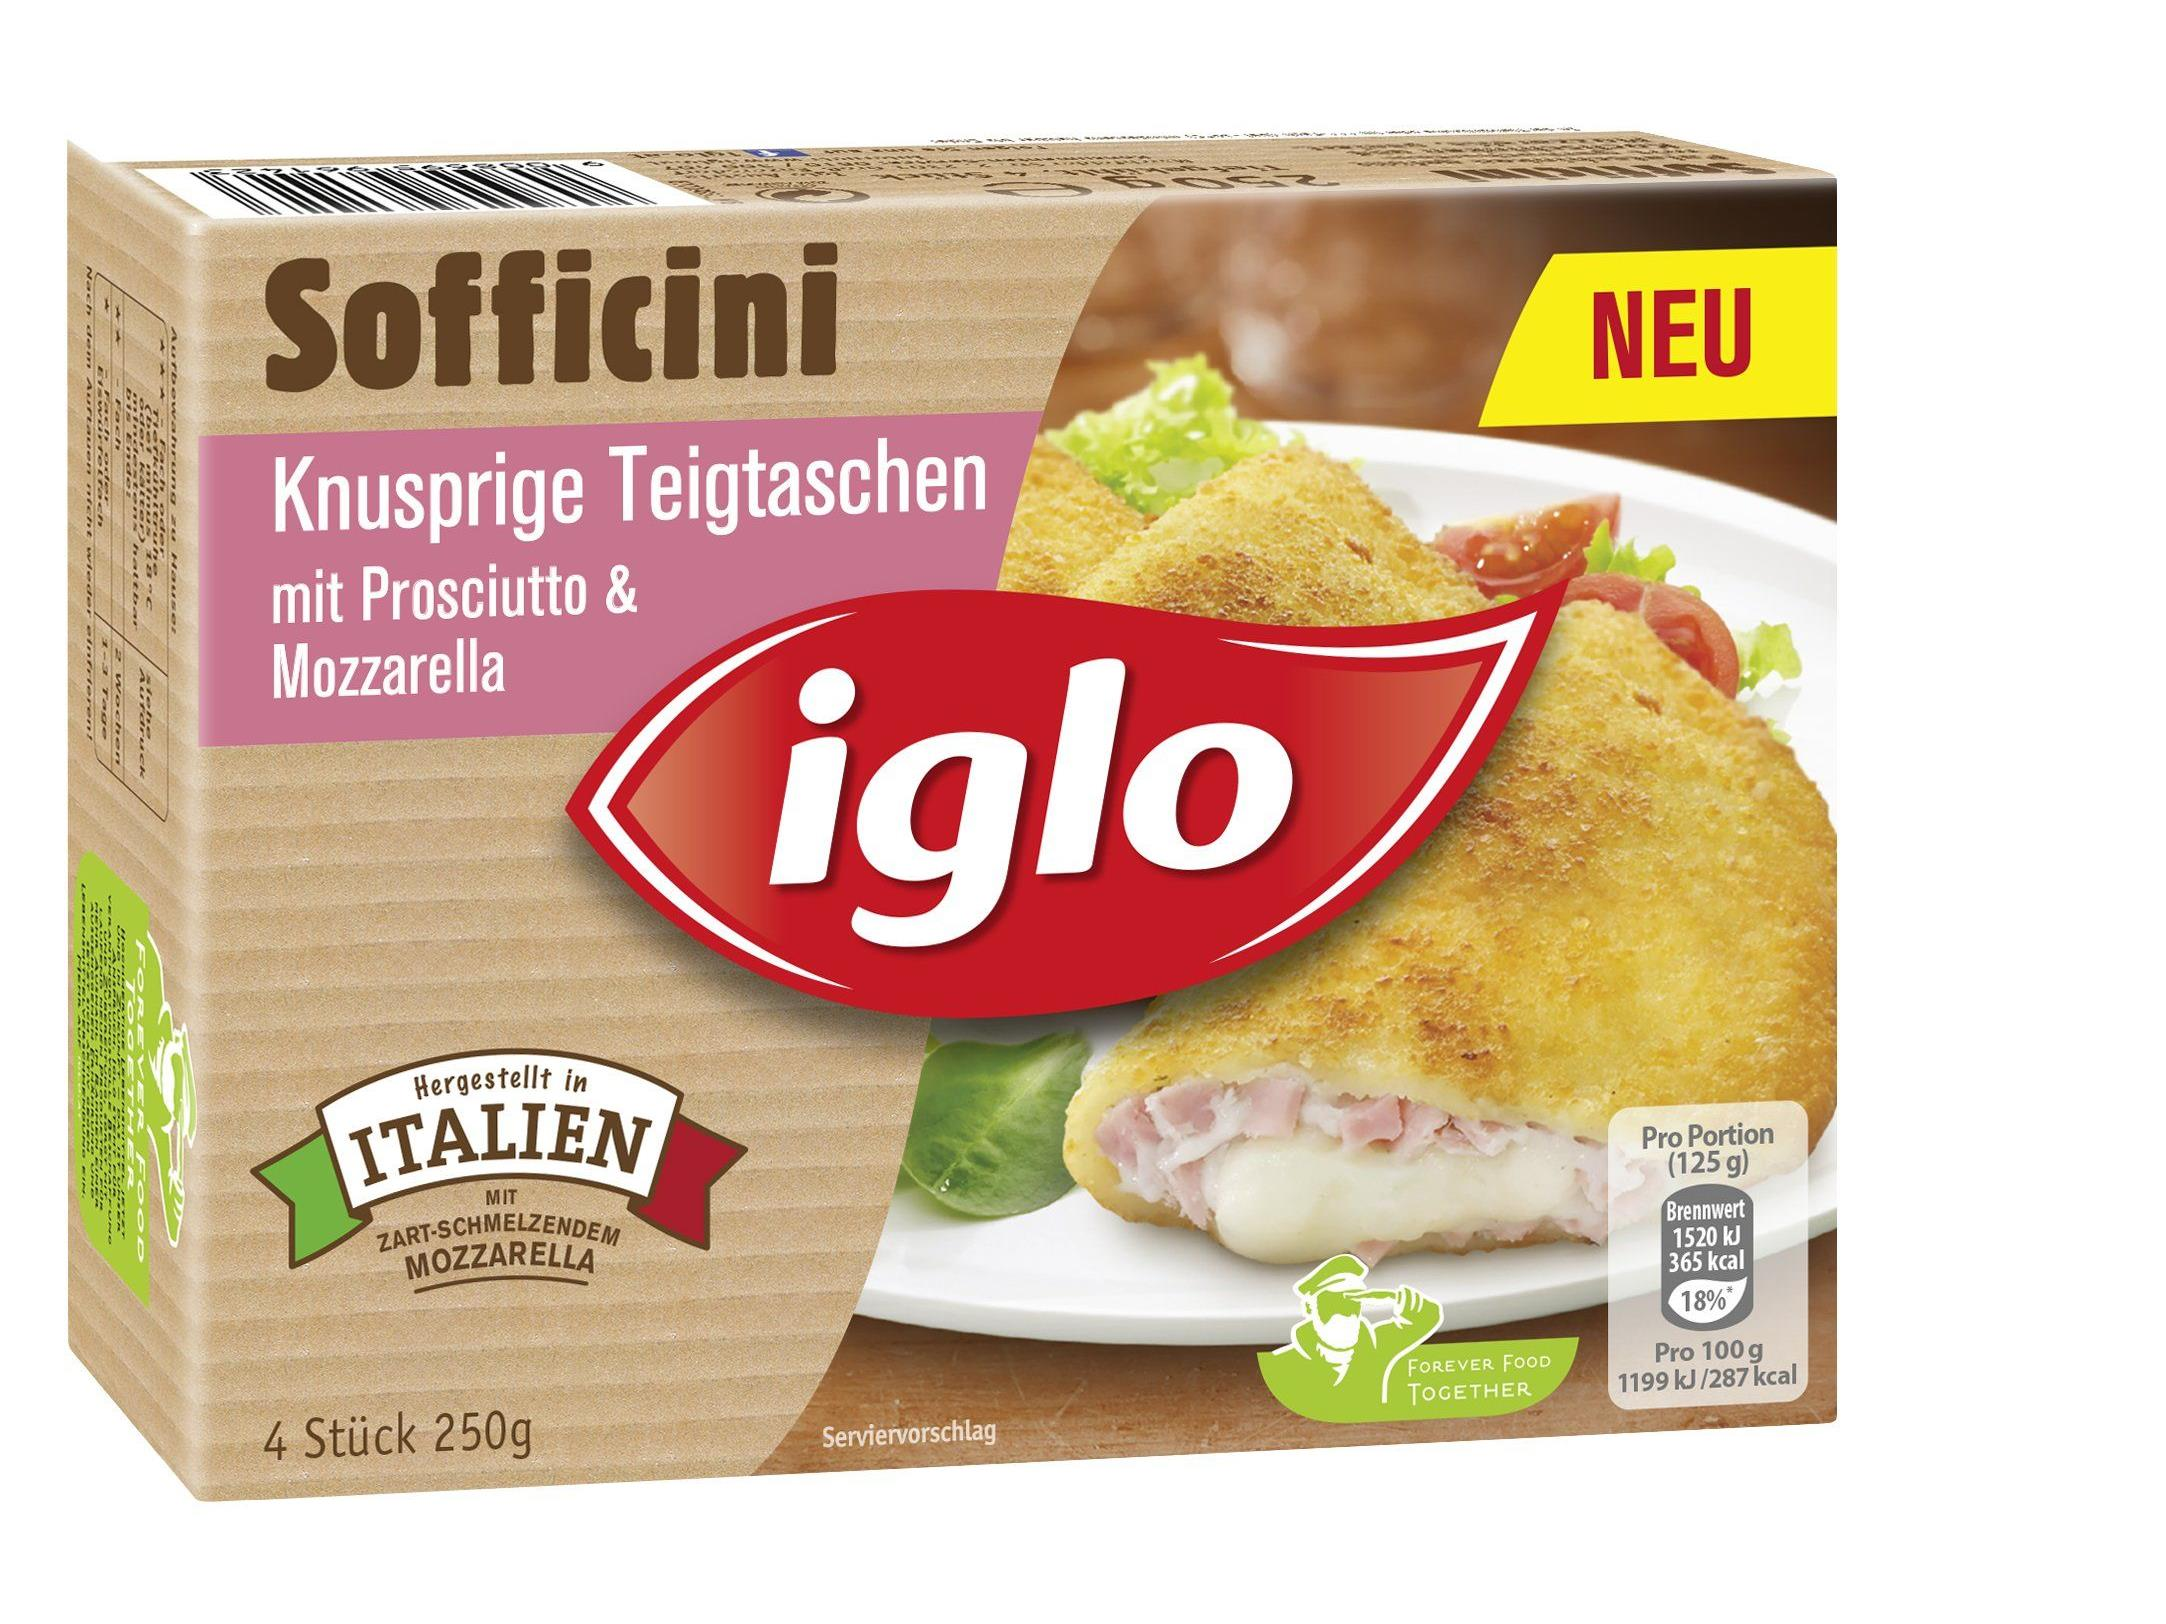 Drei Iglo Sofficini-Feinschmeckerpakete gewinnen!